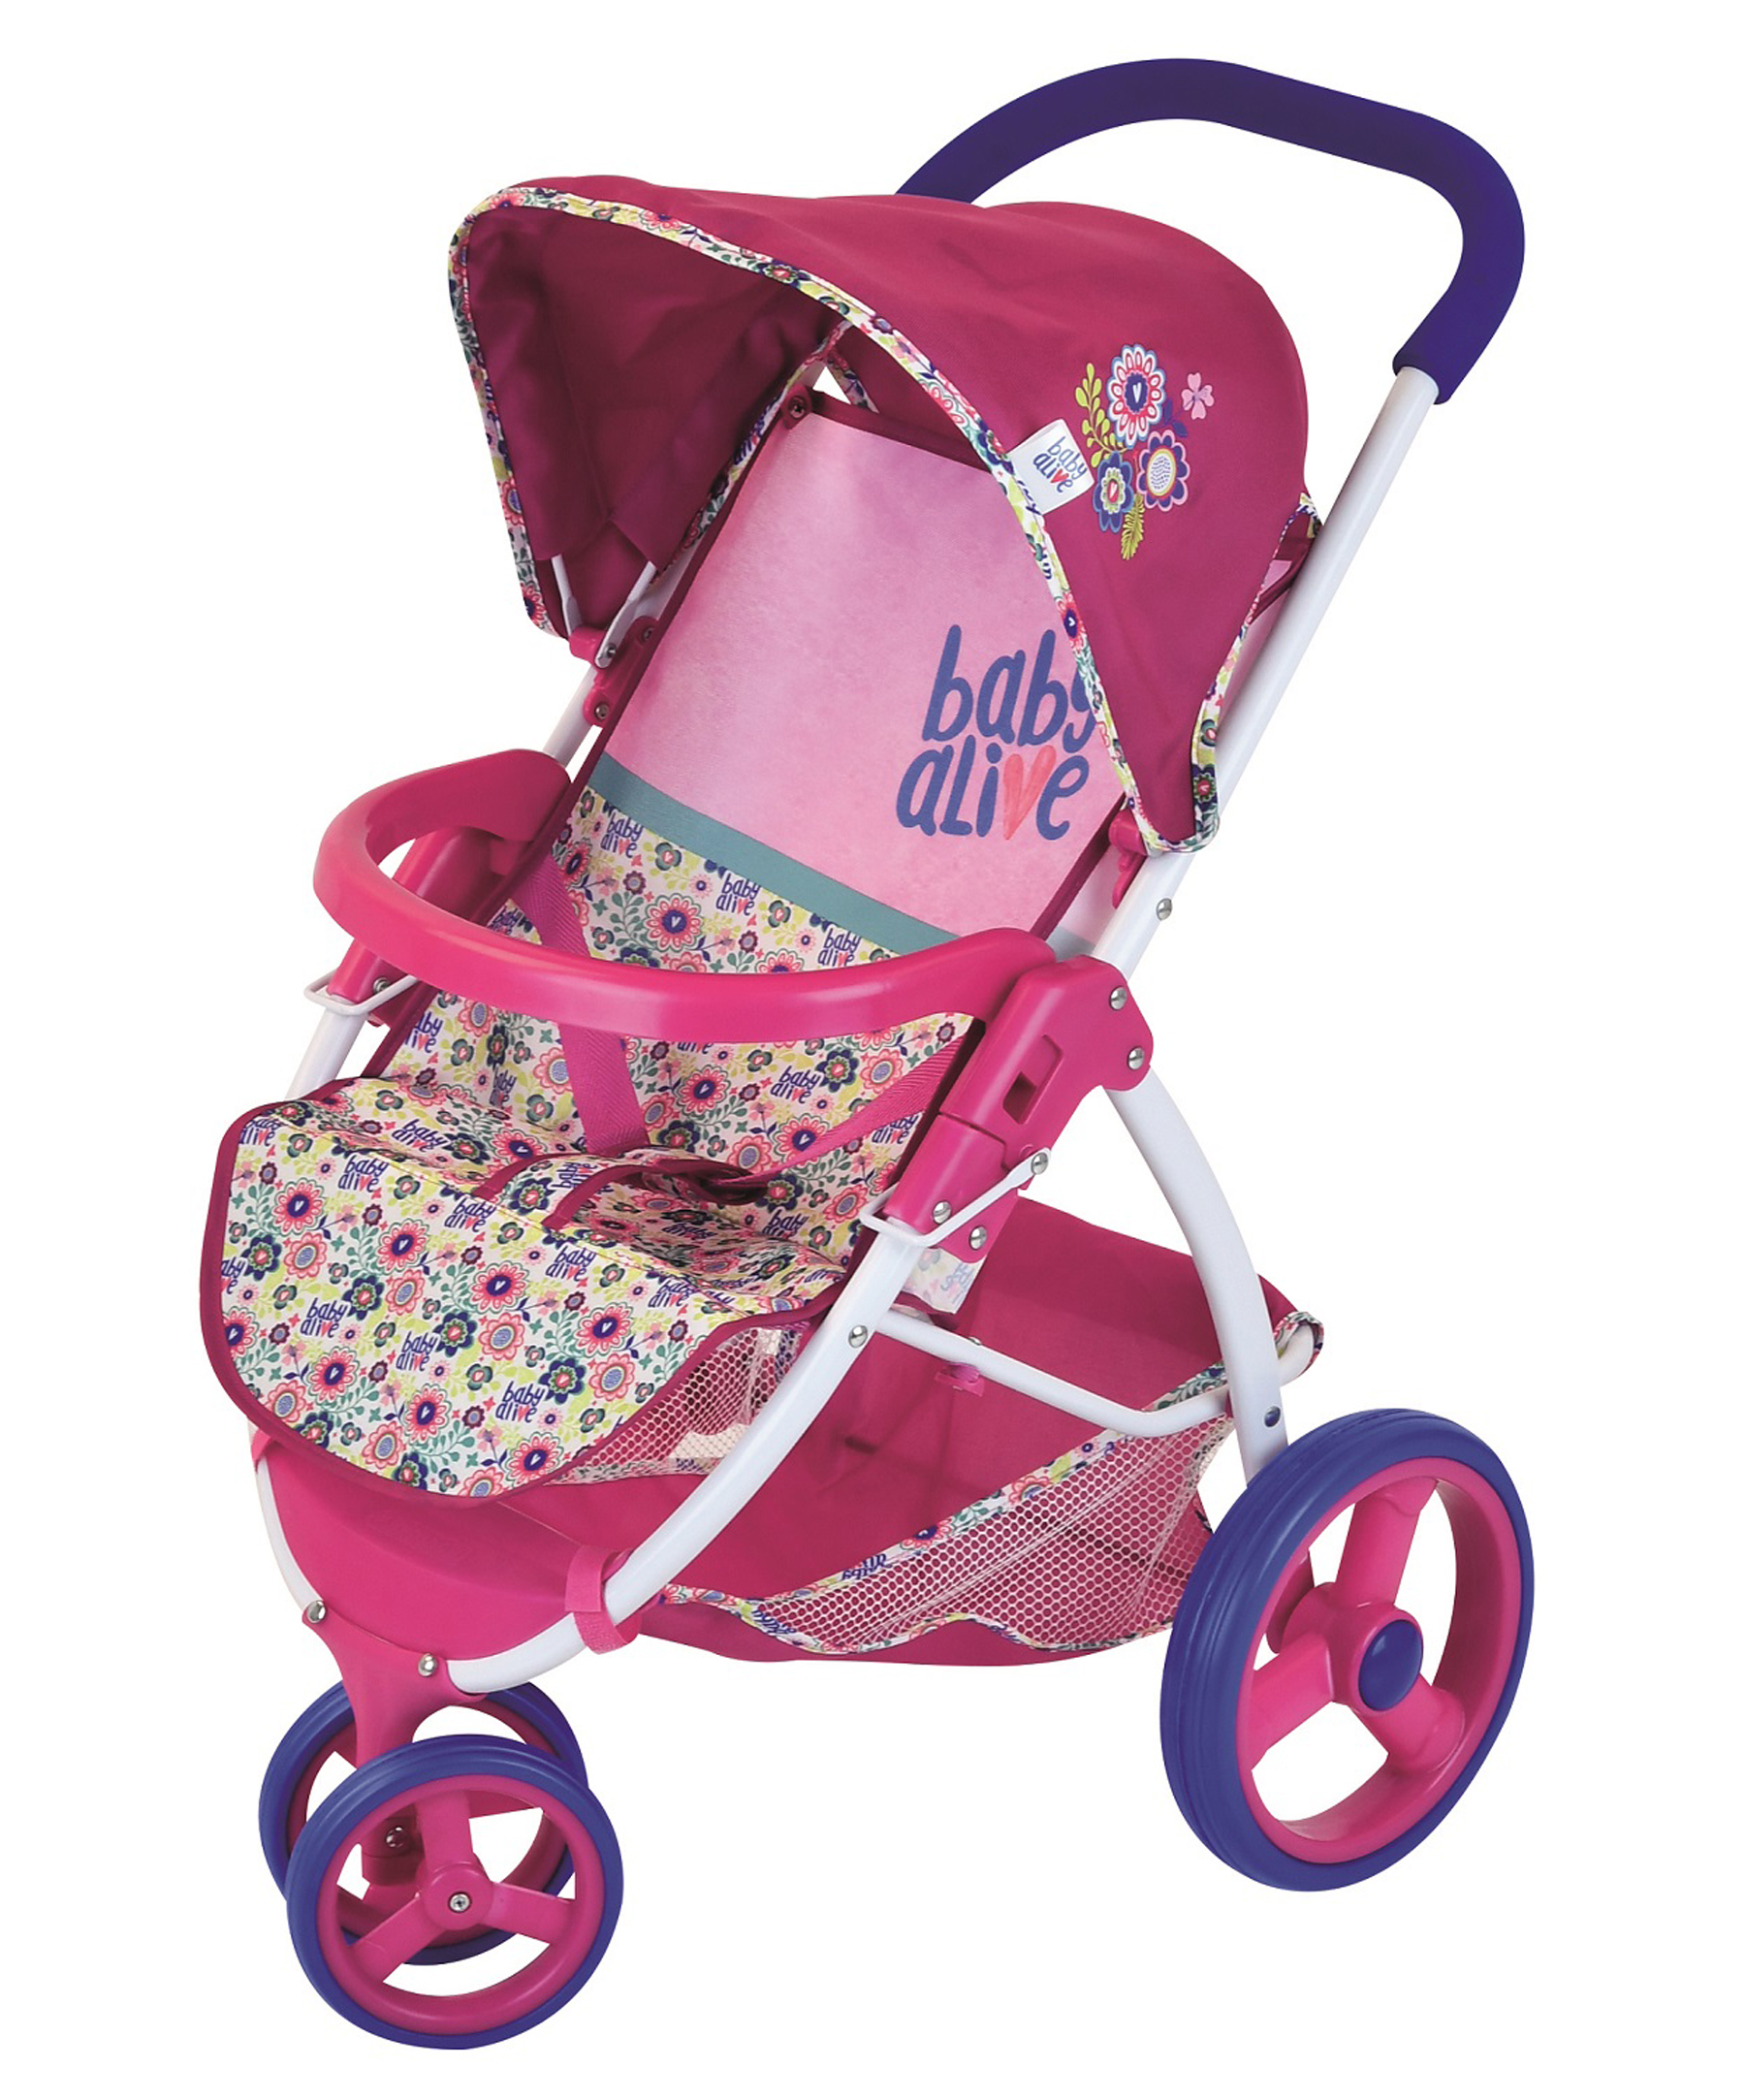 Hasbro Baby Alive Lifestyle Stroller Walmart